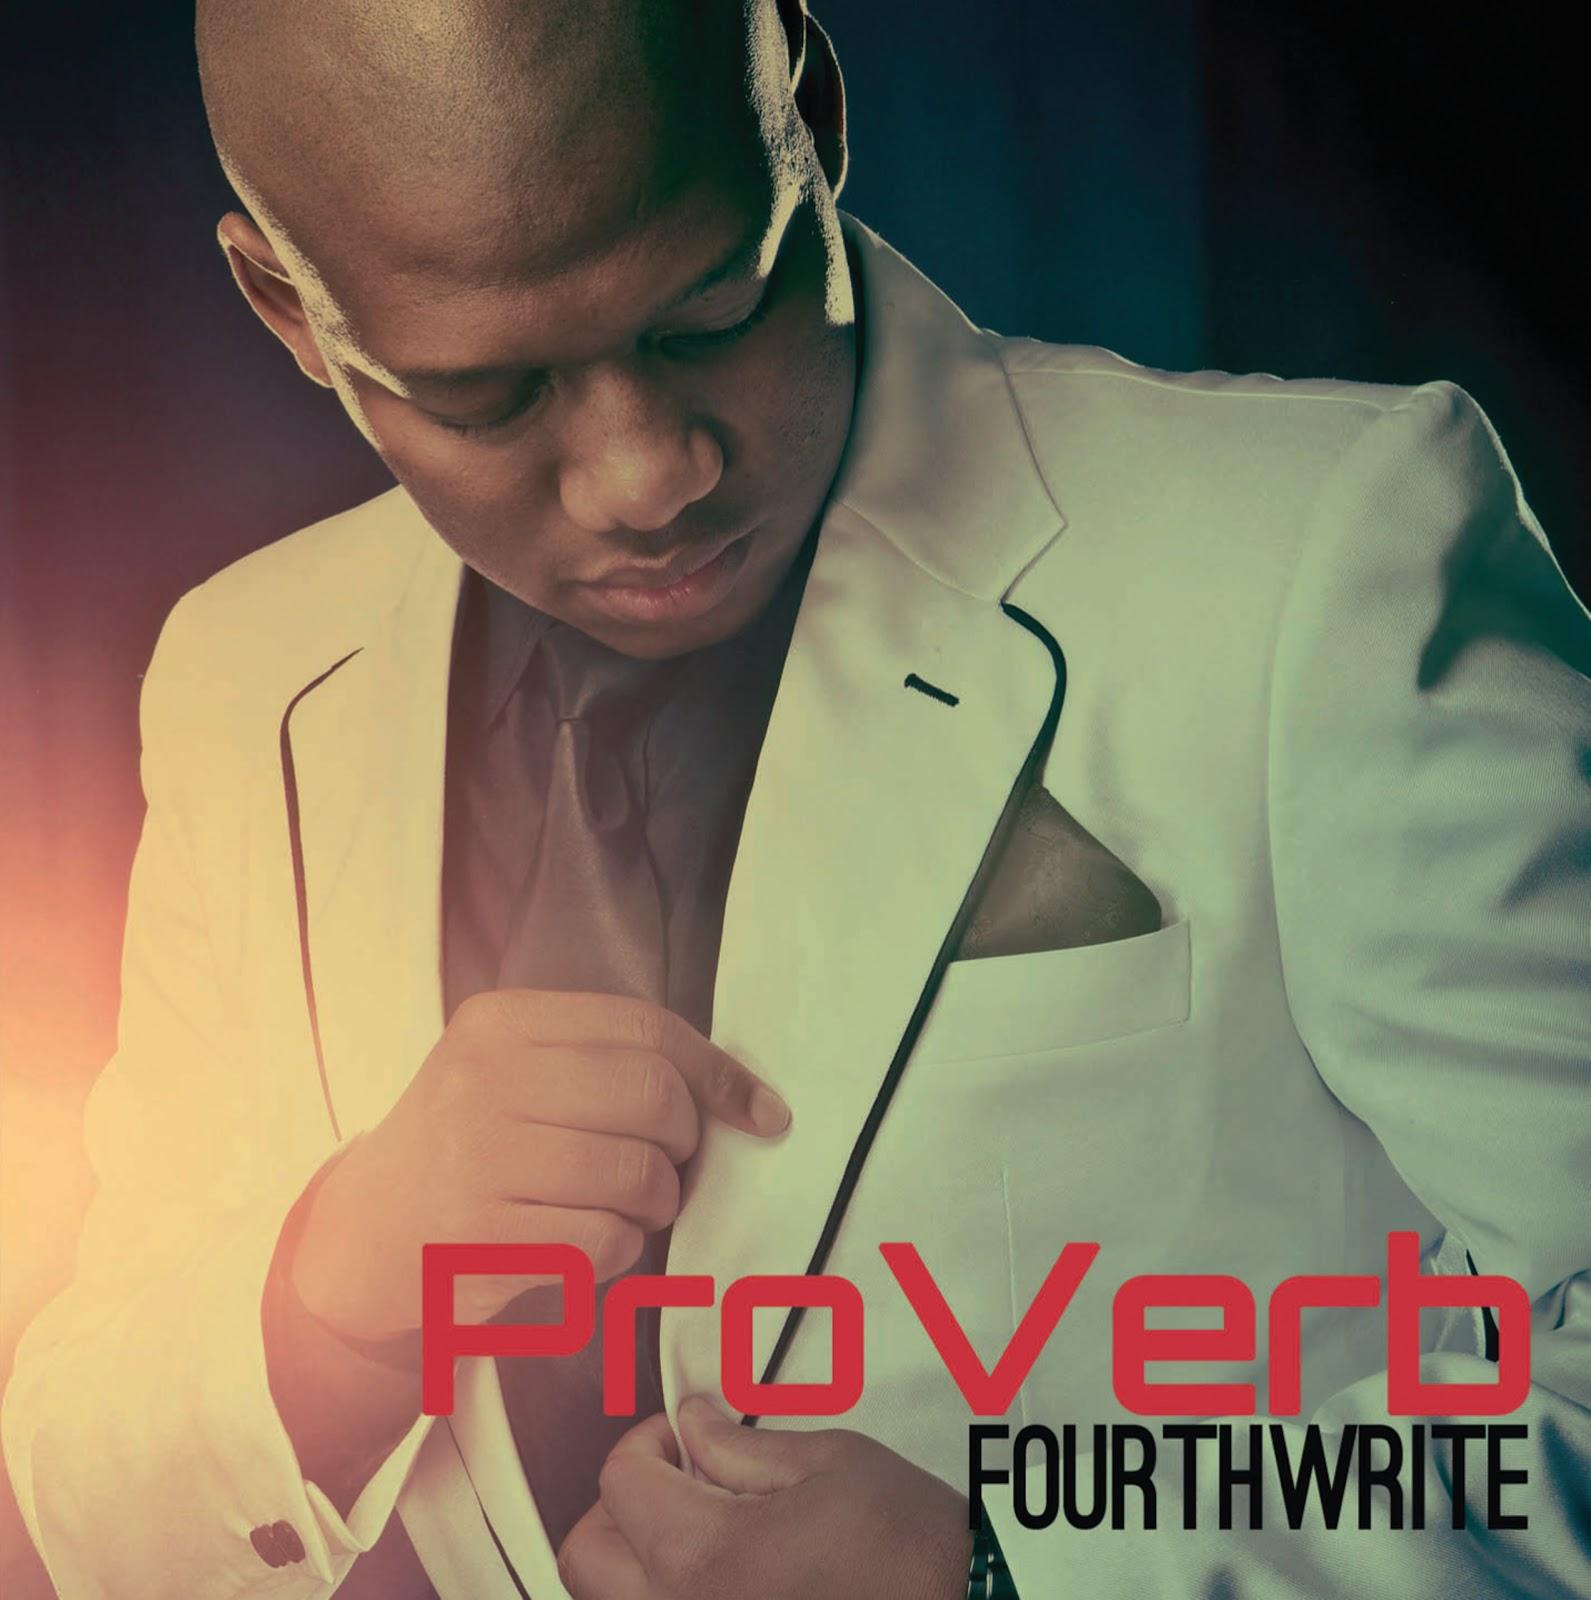 proverb forthwrite album download zip